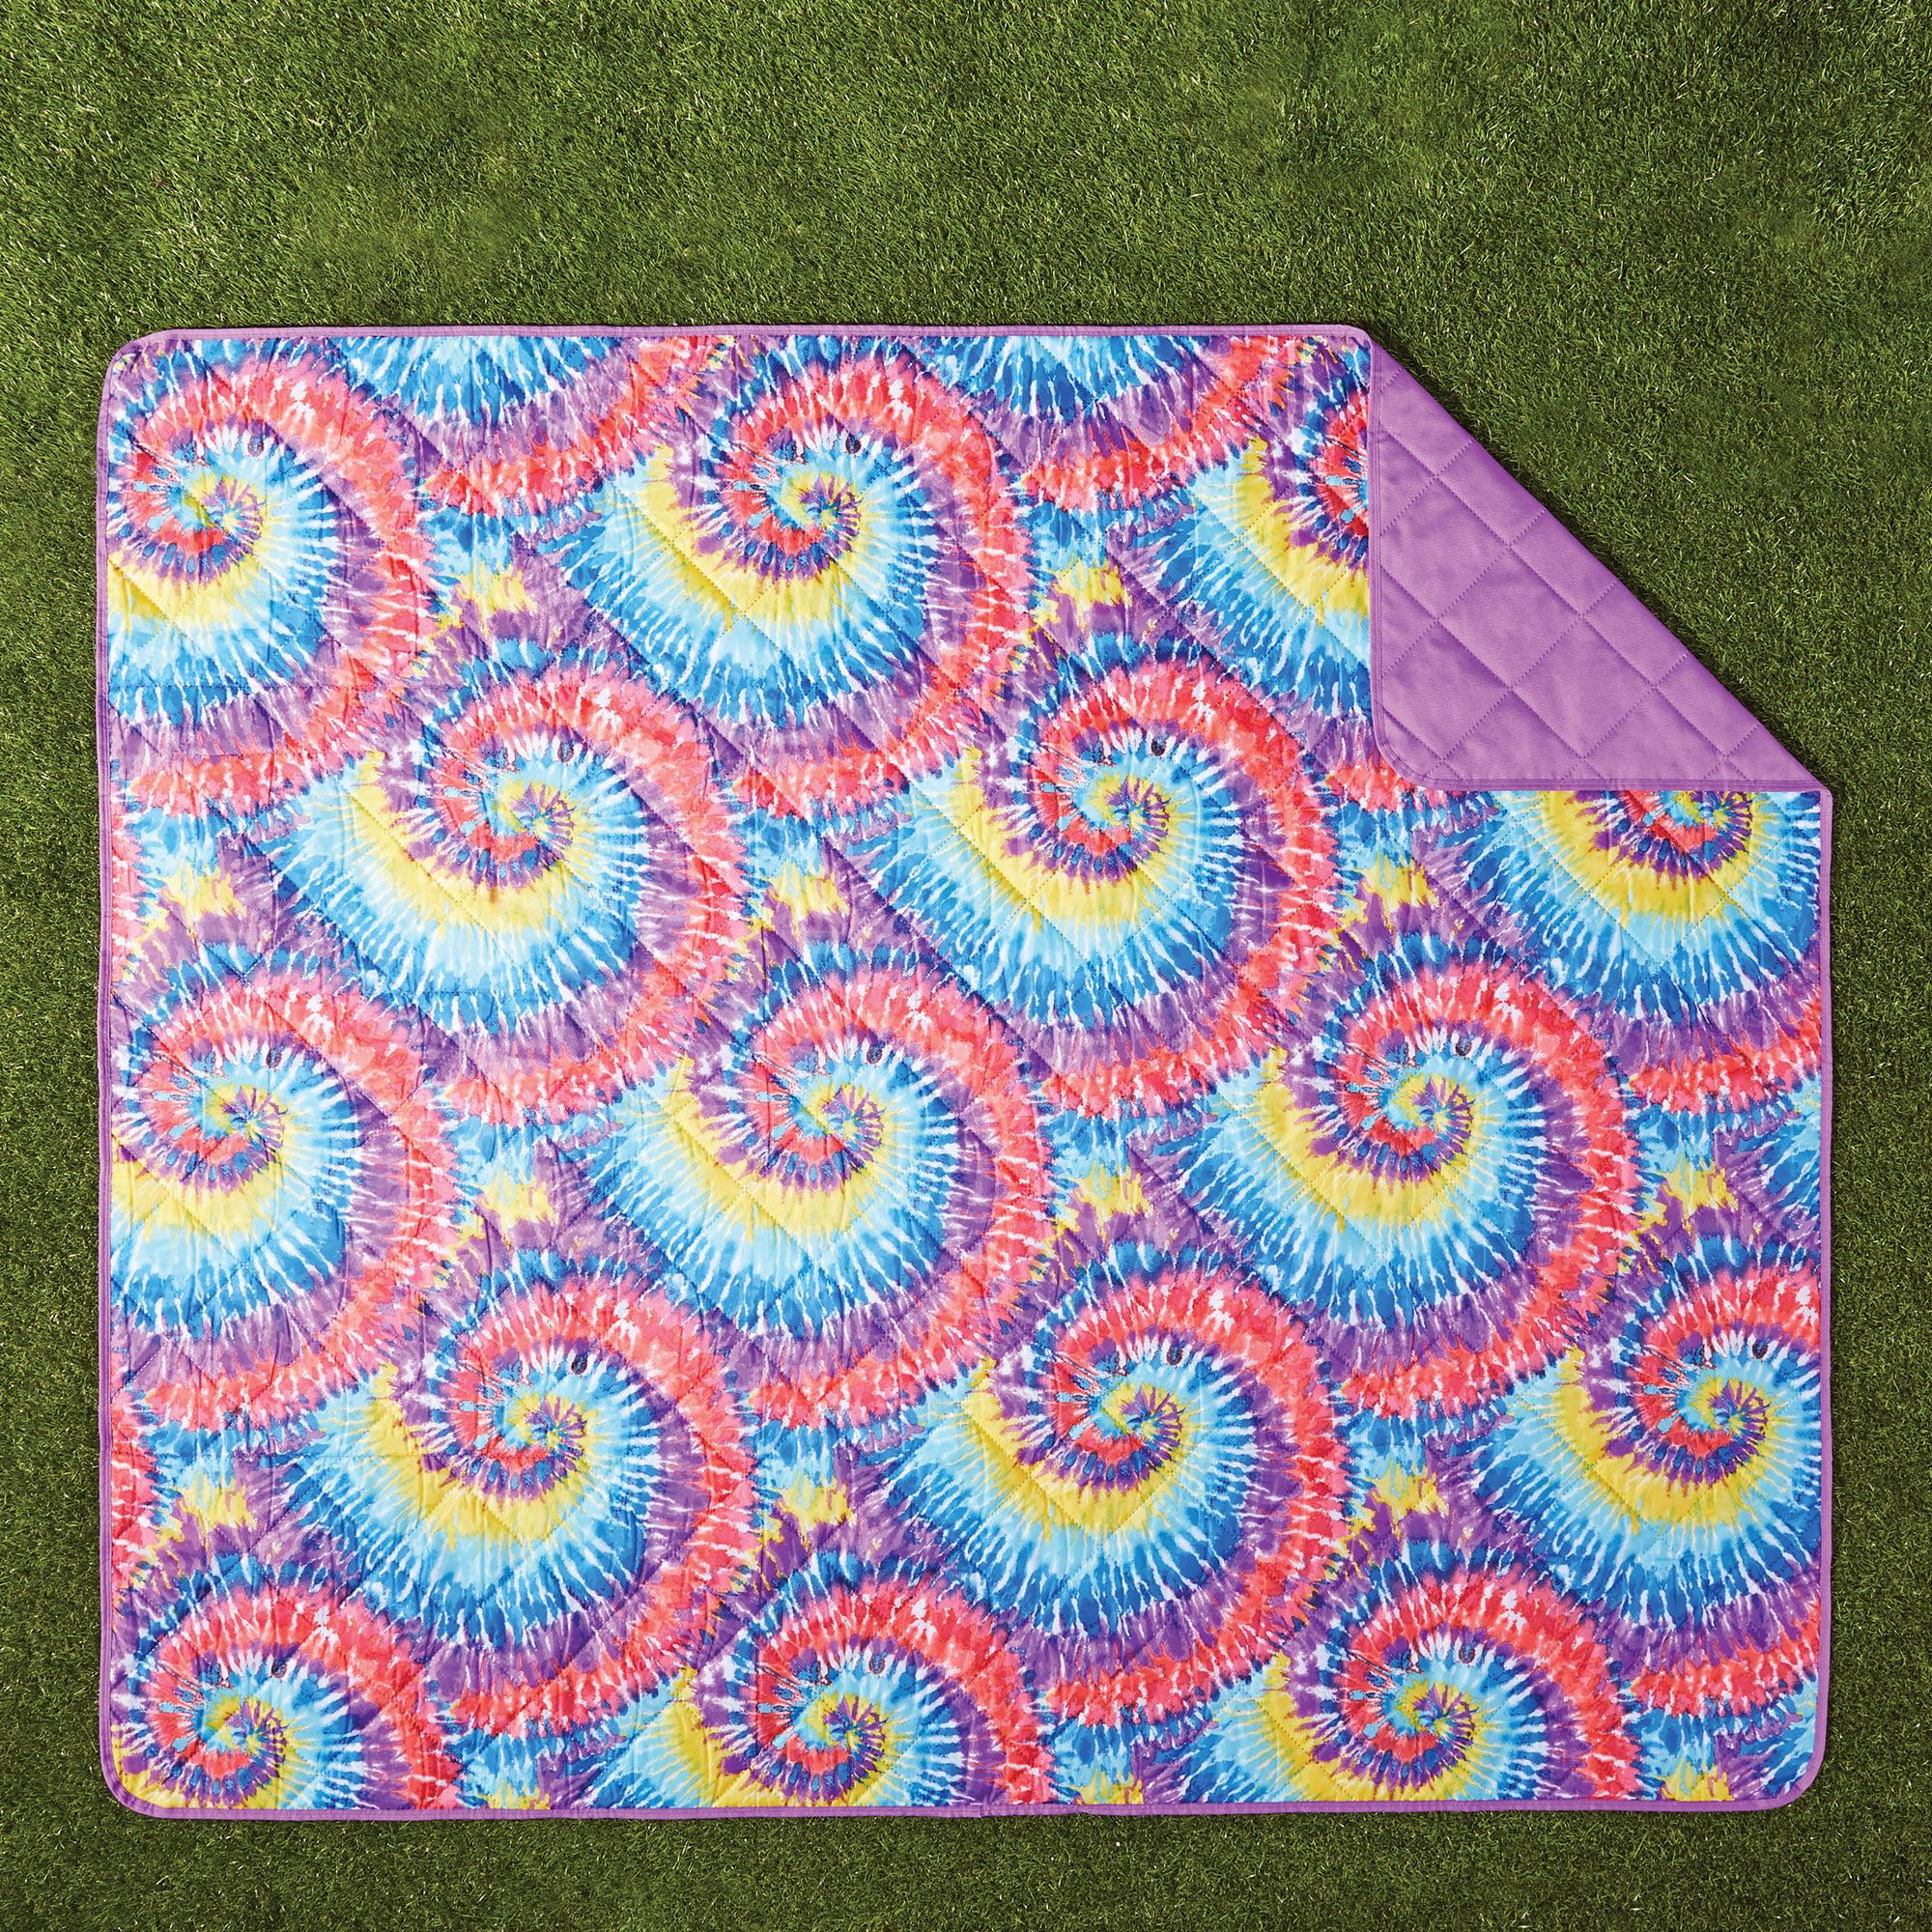 Mainstays Tye Dye Outdoor Blanket, 1 Each